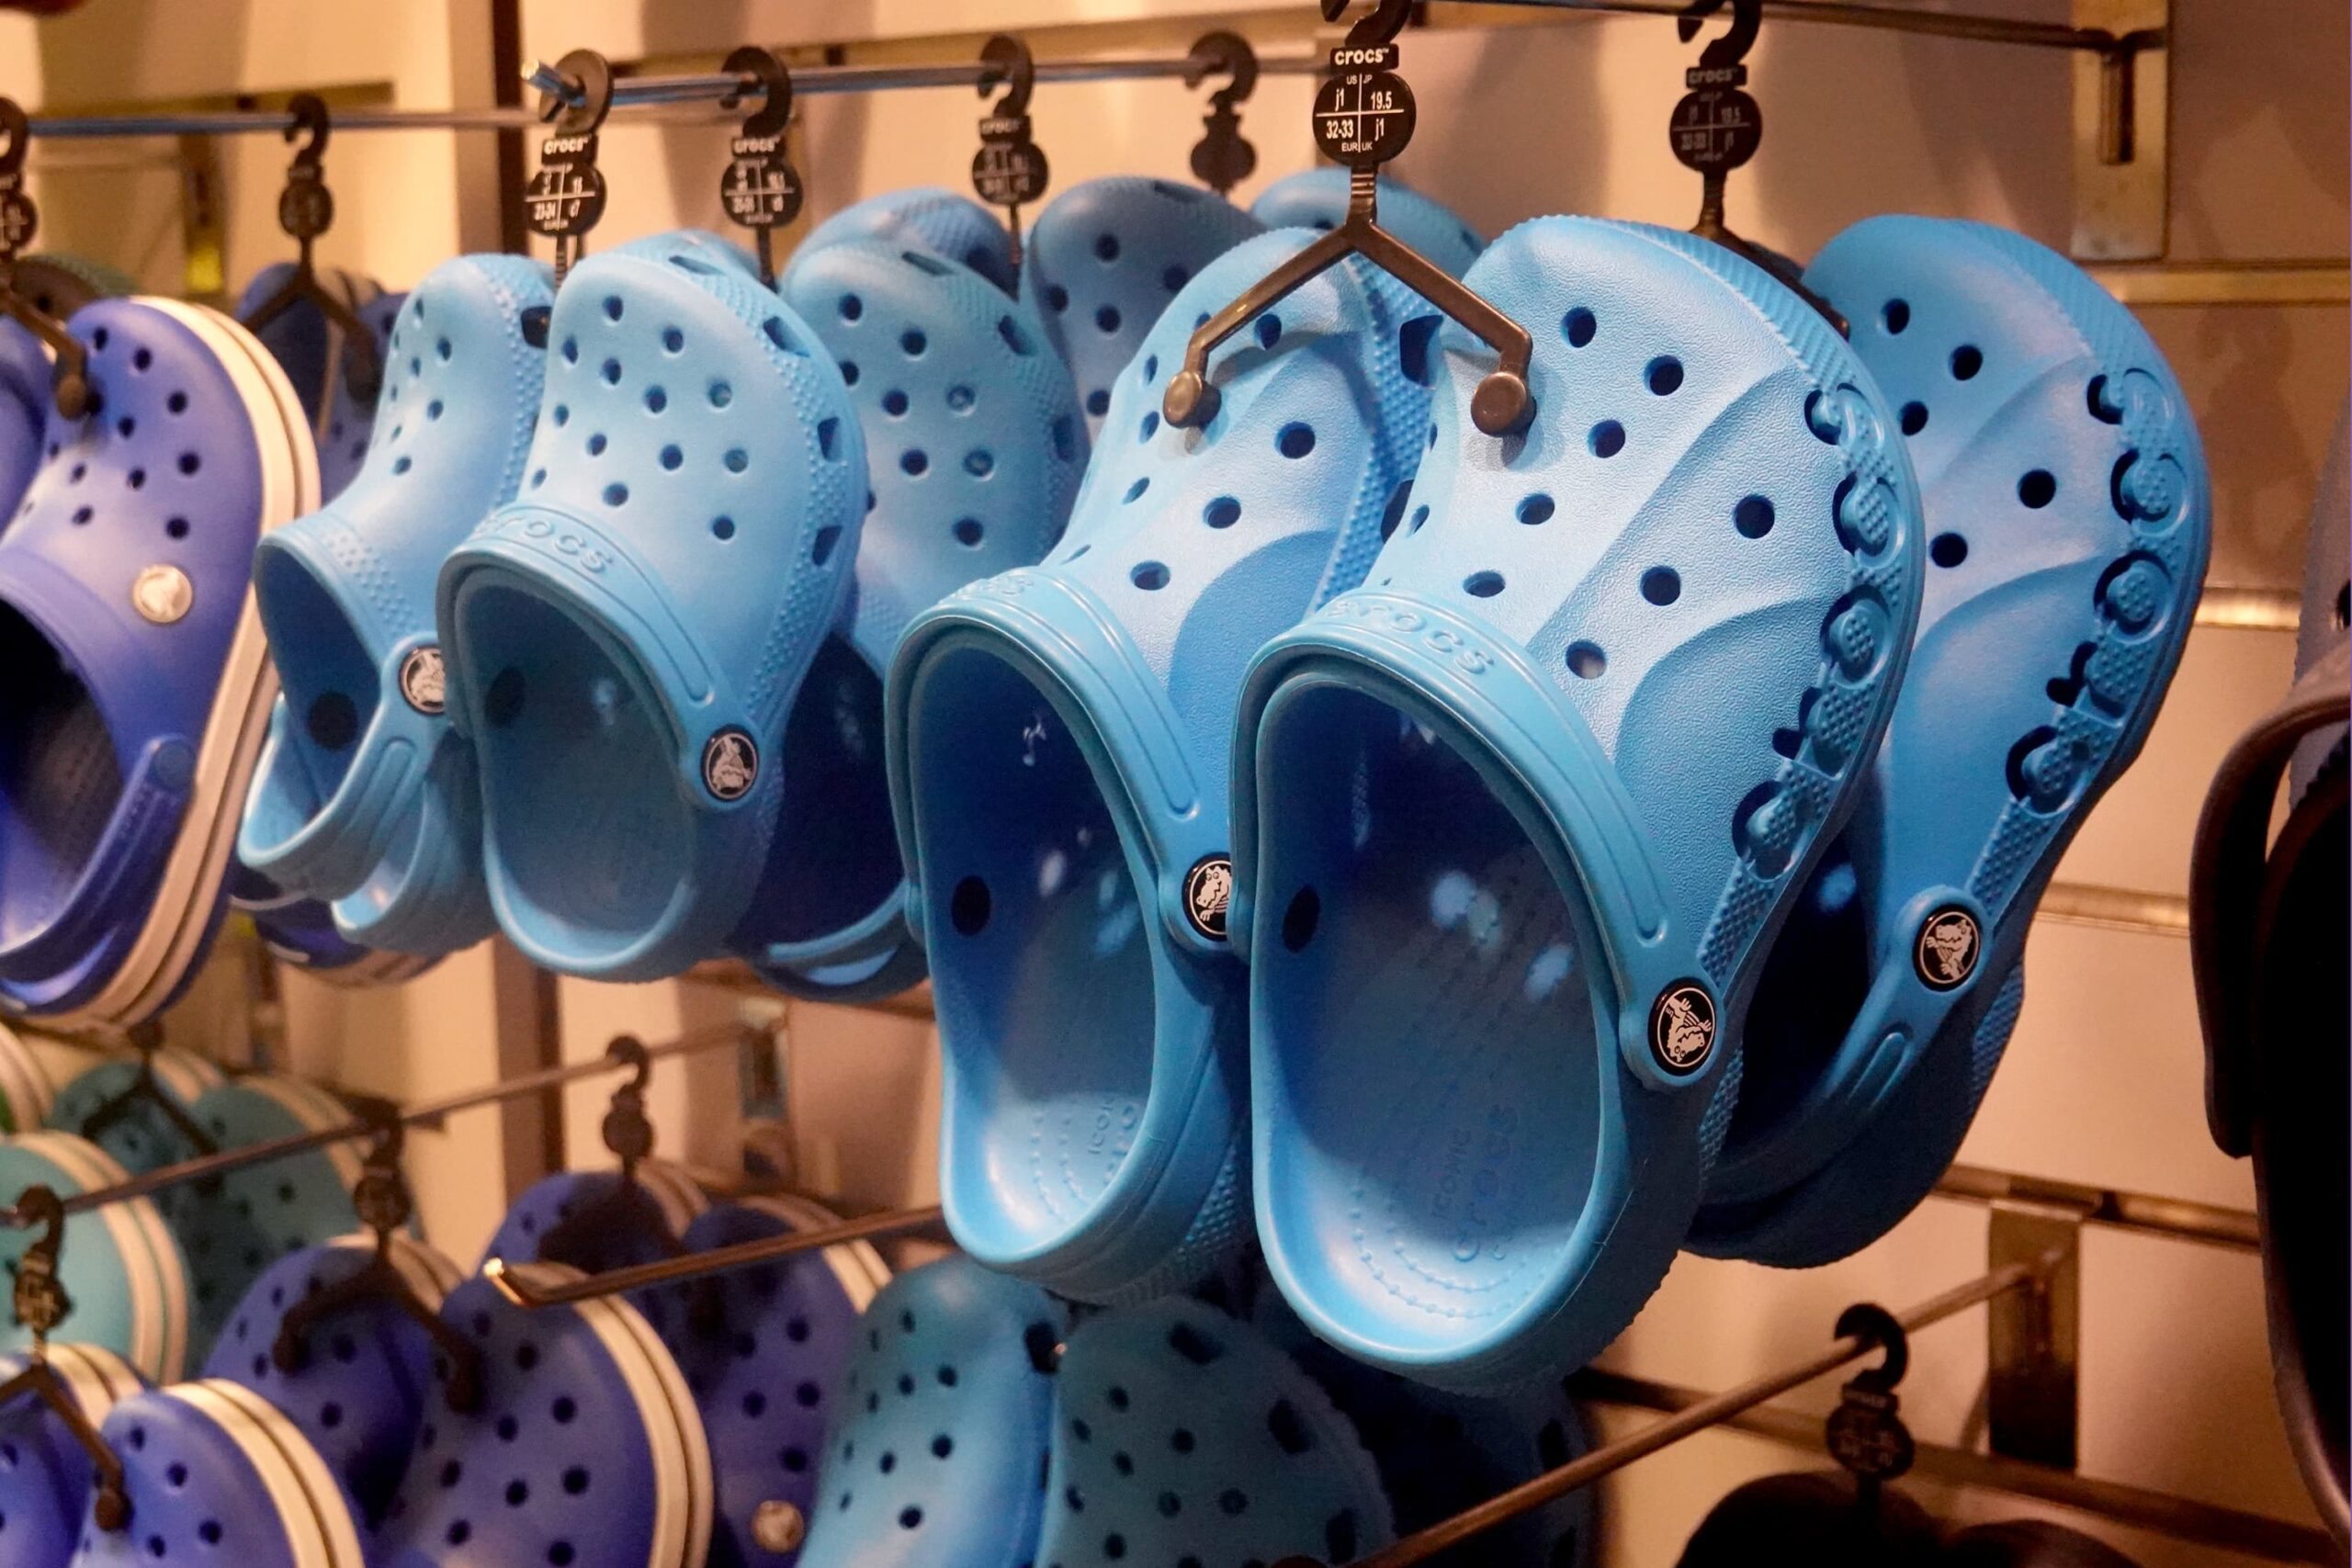 Crocs (CROX) Q3 2021 earnings beat, shares rise